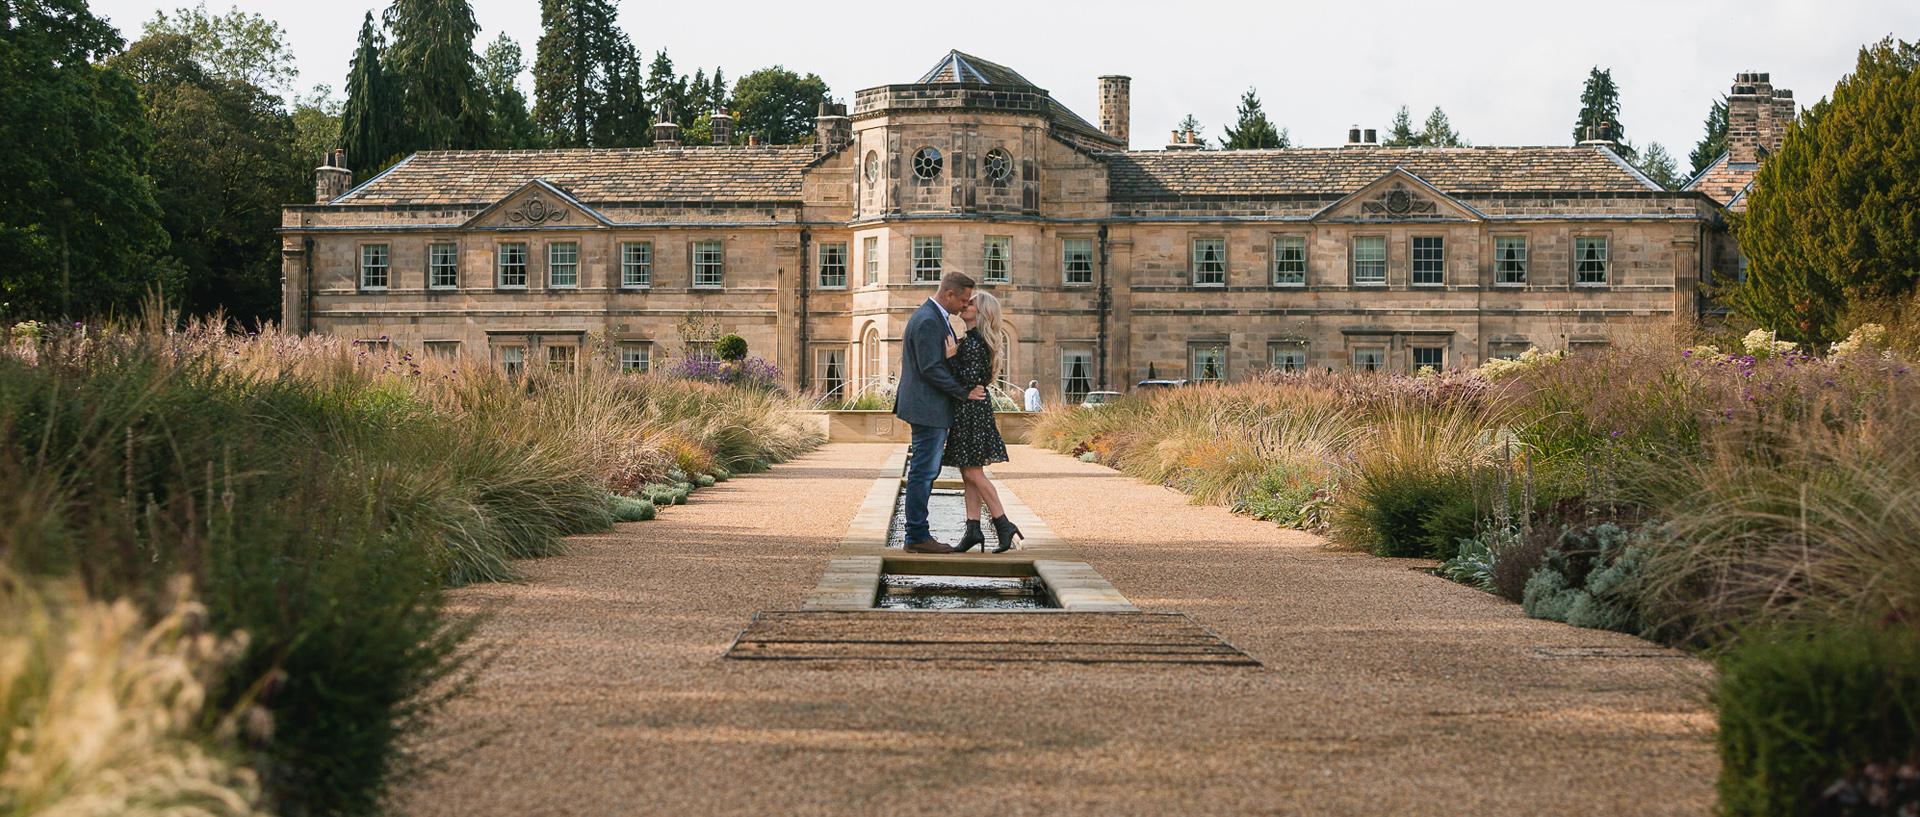 Grantley Hall - Pre wedding Photography Shoot